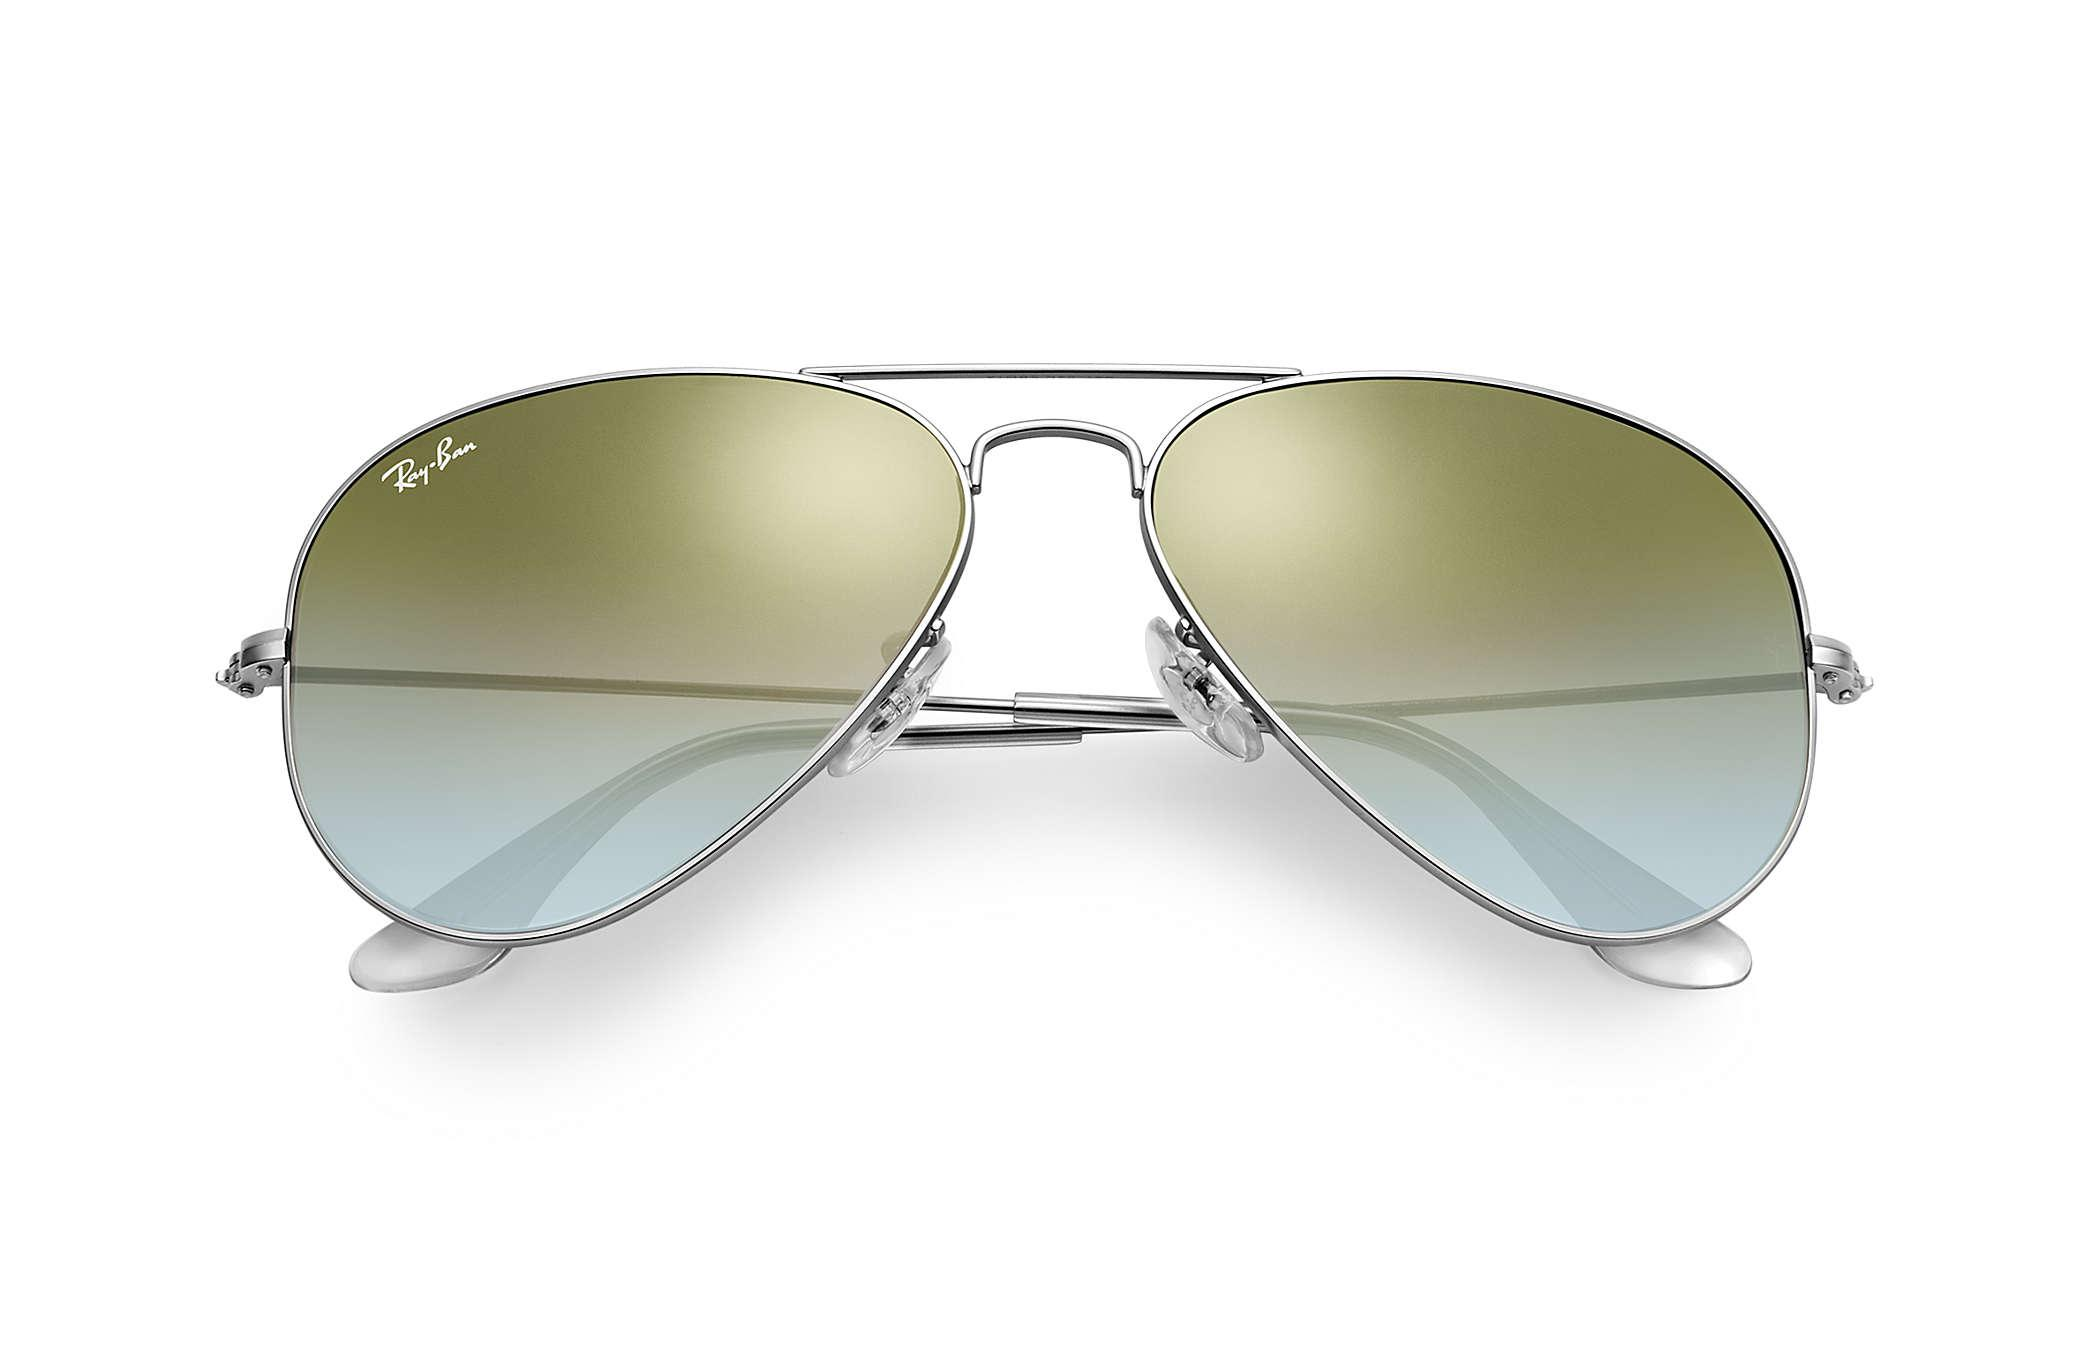 Ray-Ban - Green Aviator Flash Lenses Gradient - Lyst. View fullscreen fd9d2a9788